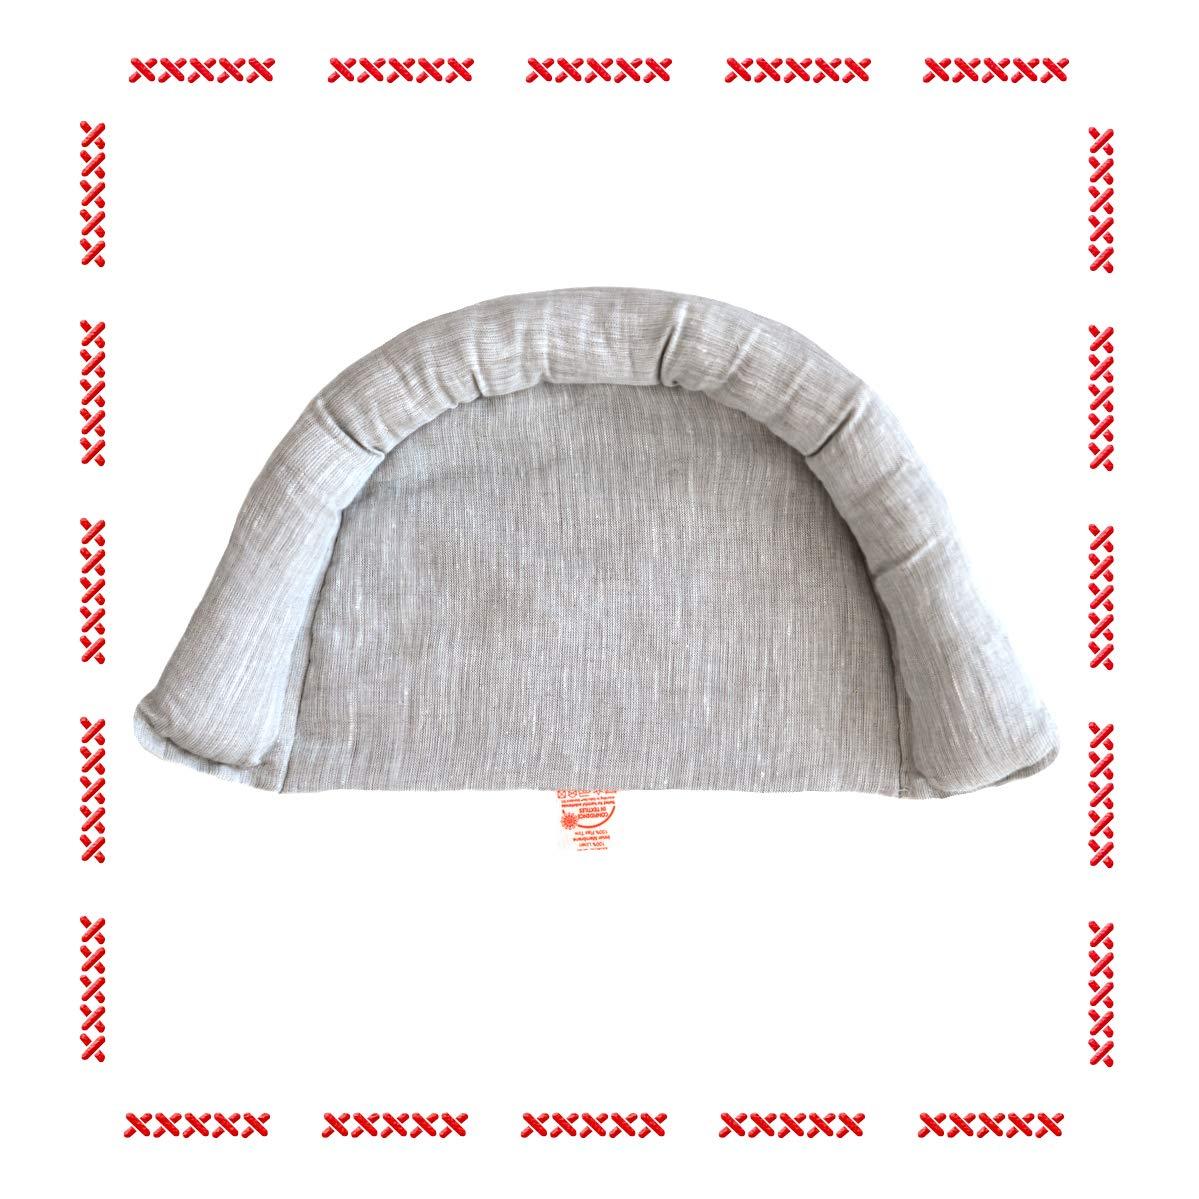 Wholesome Linen Organic Flax Wedge Edge/Bassinet Mattress Bumper/Baby Head Rest/for Newborns from 0-6 Months